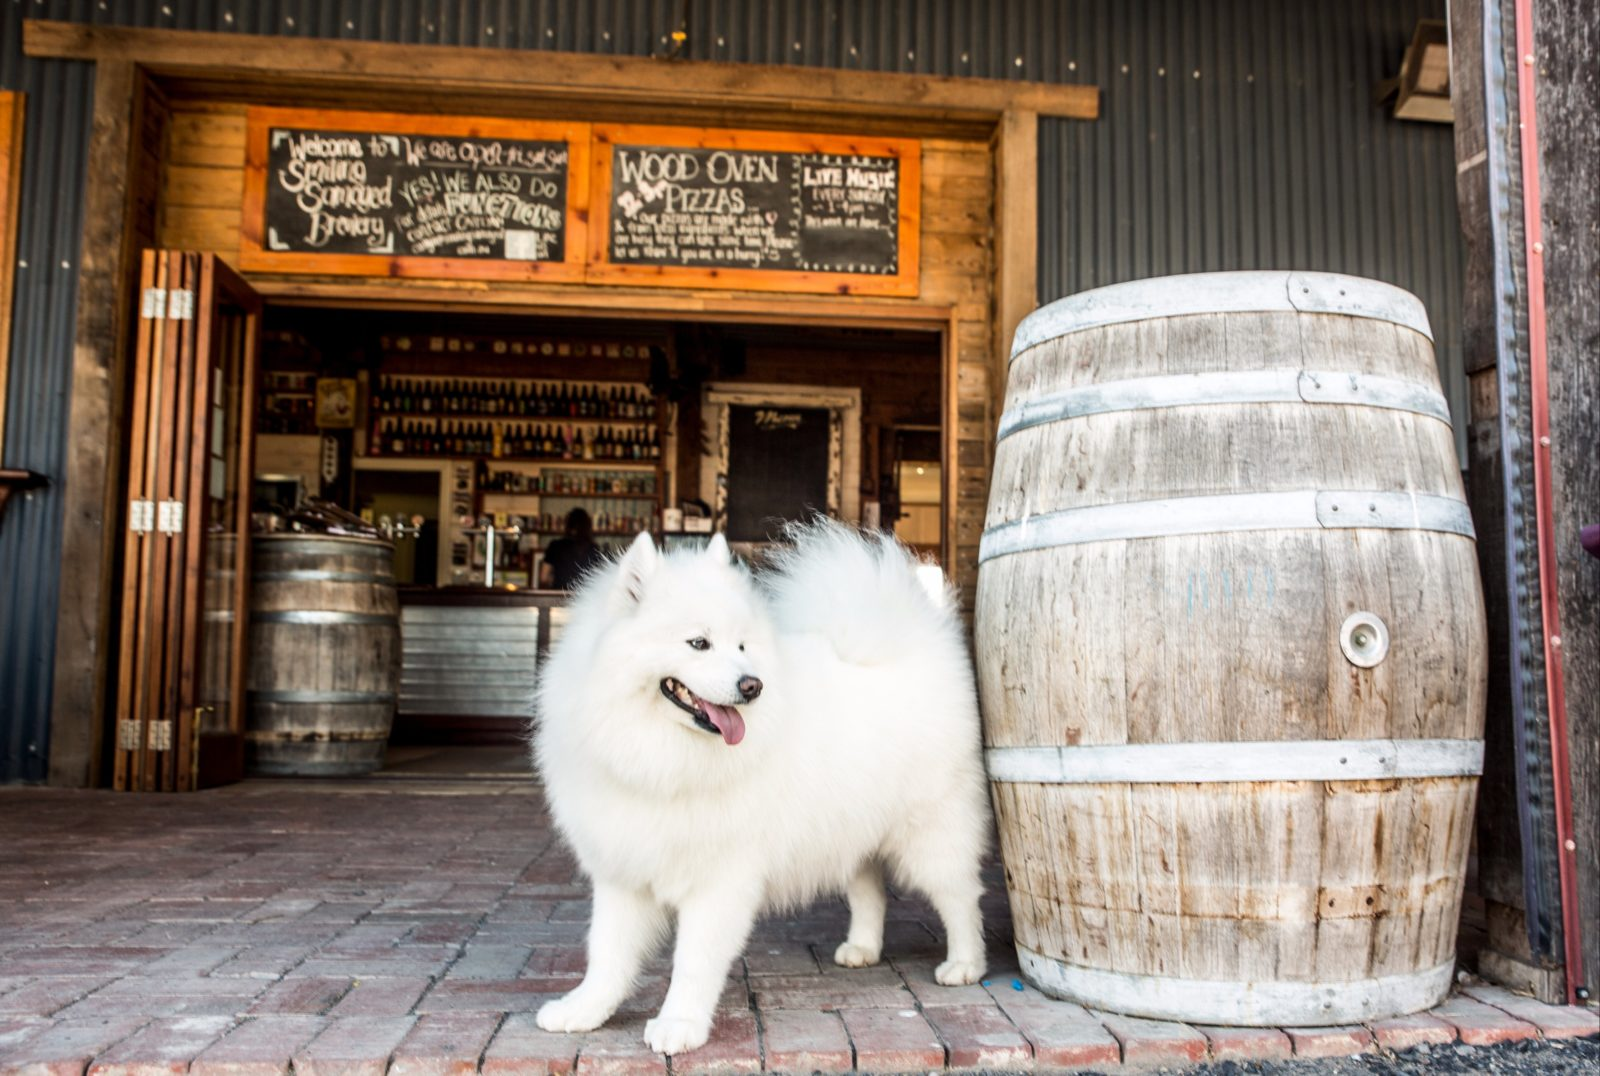 Hoppy the Samoyed greets guests at Smiling Samoyed Brewery